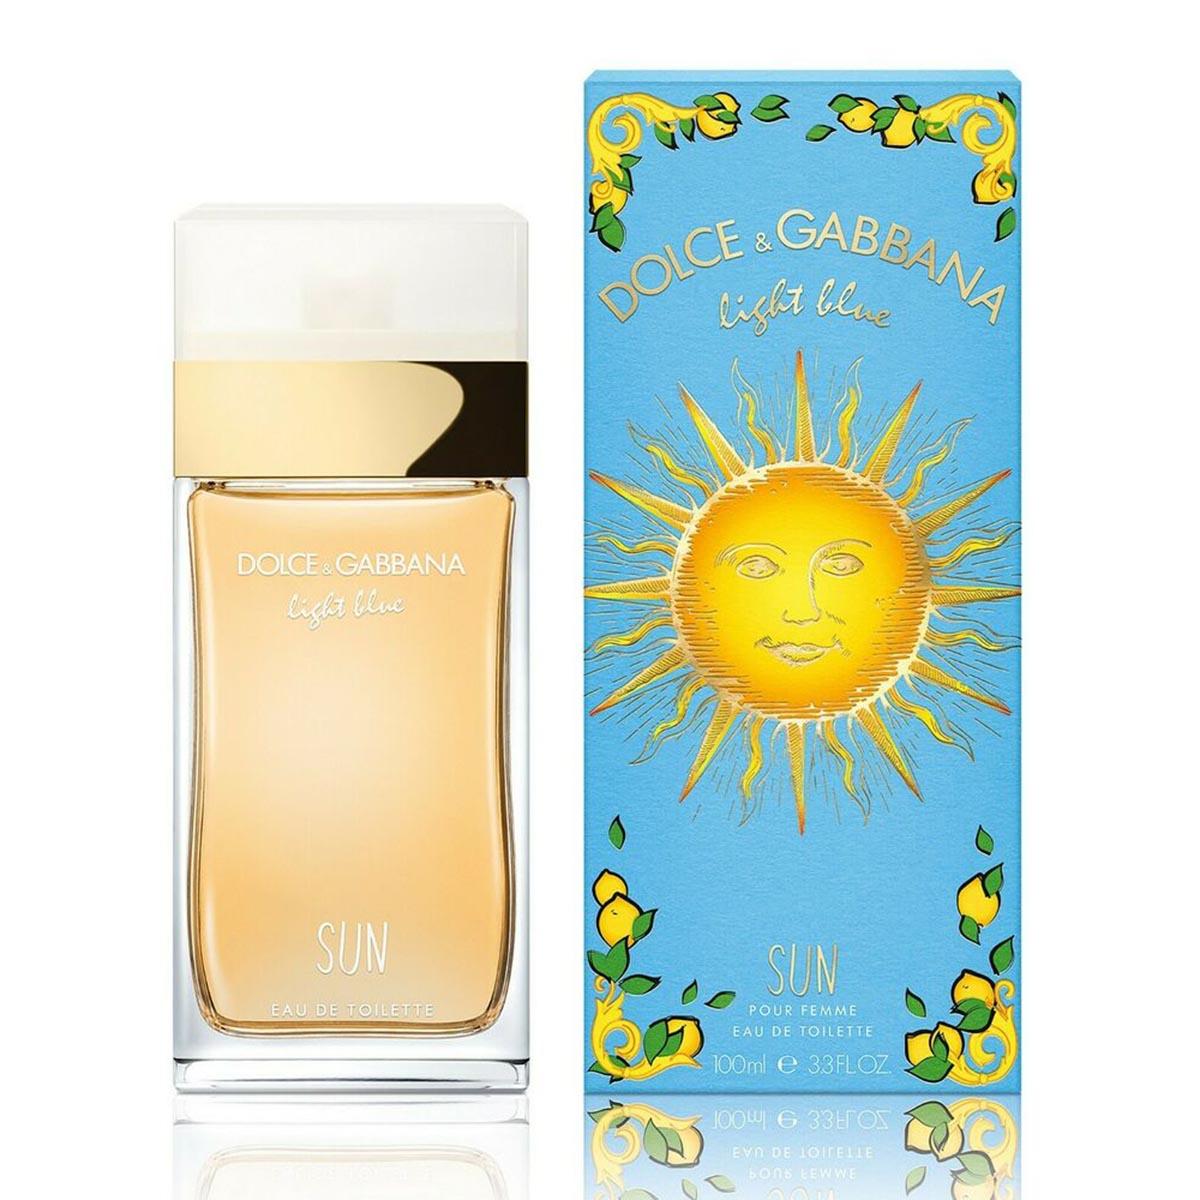 Dolce gabbana light blue sun pour femme eau de toilette 100ml vaporizador edicion limitada